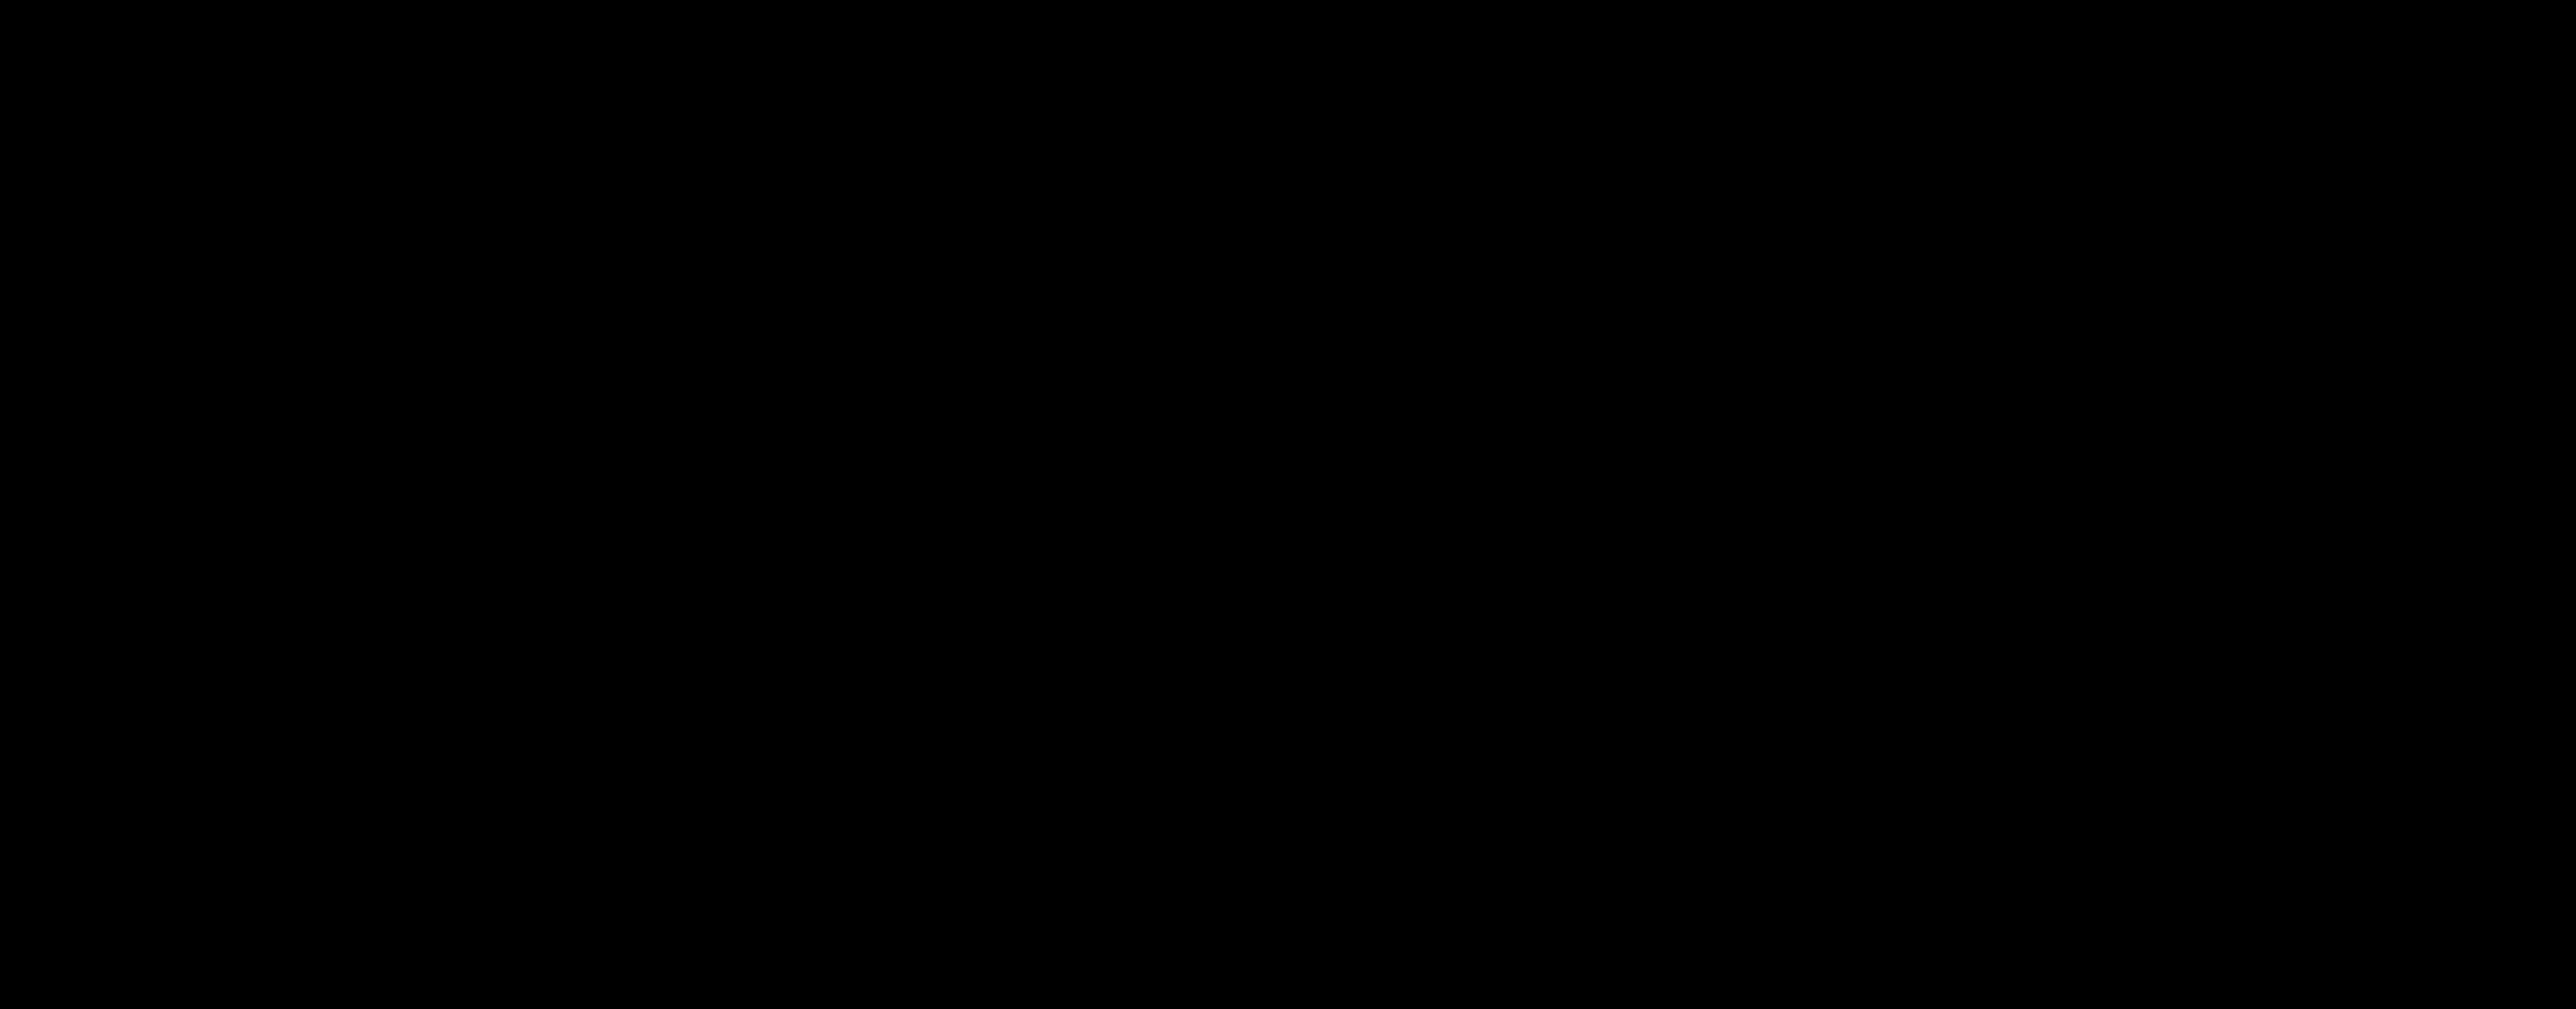 Peterson Technology, LLC